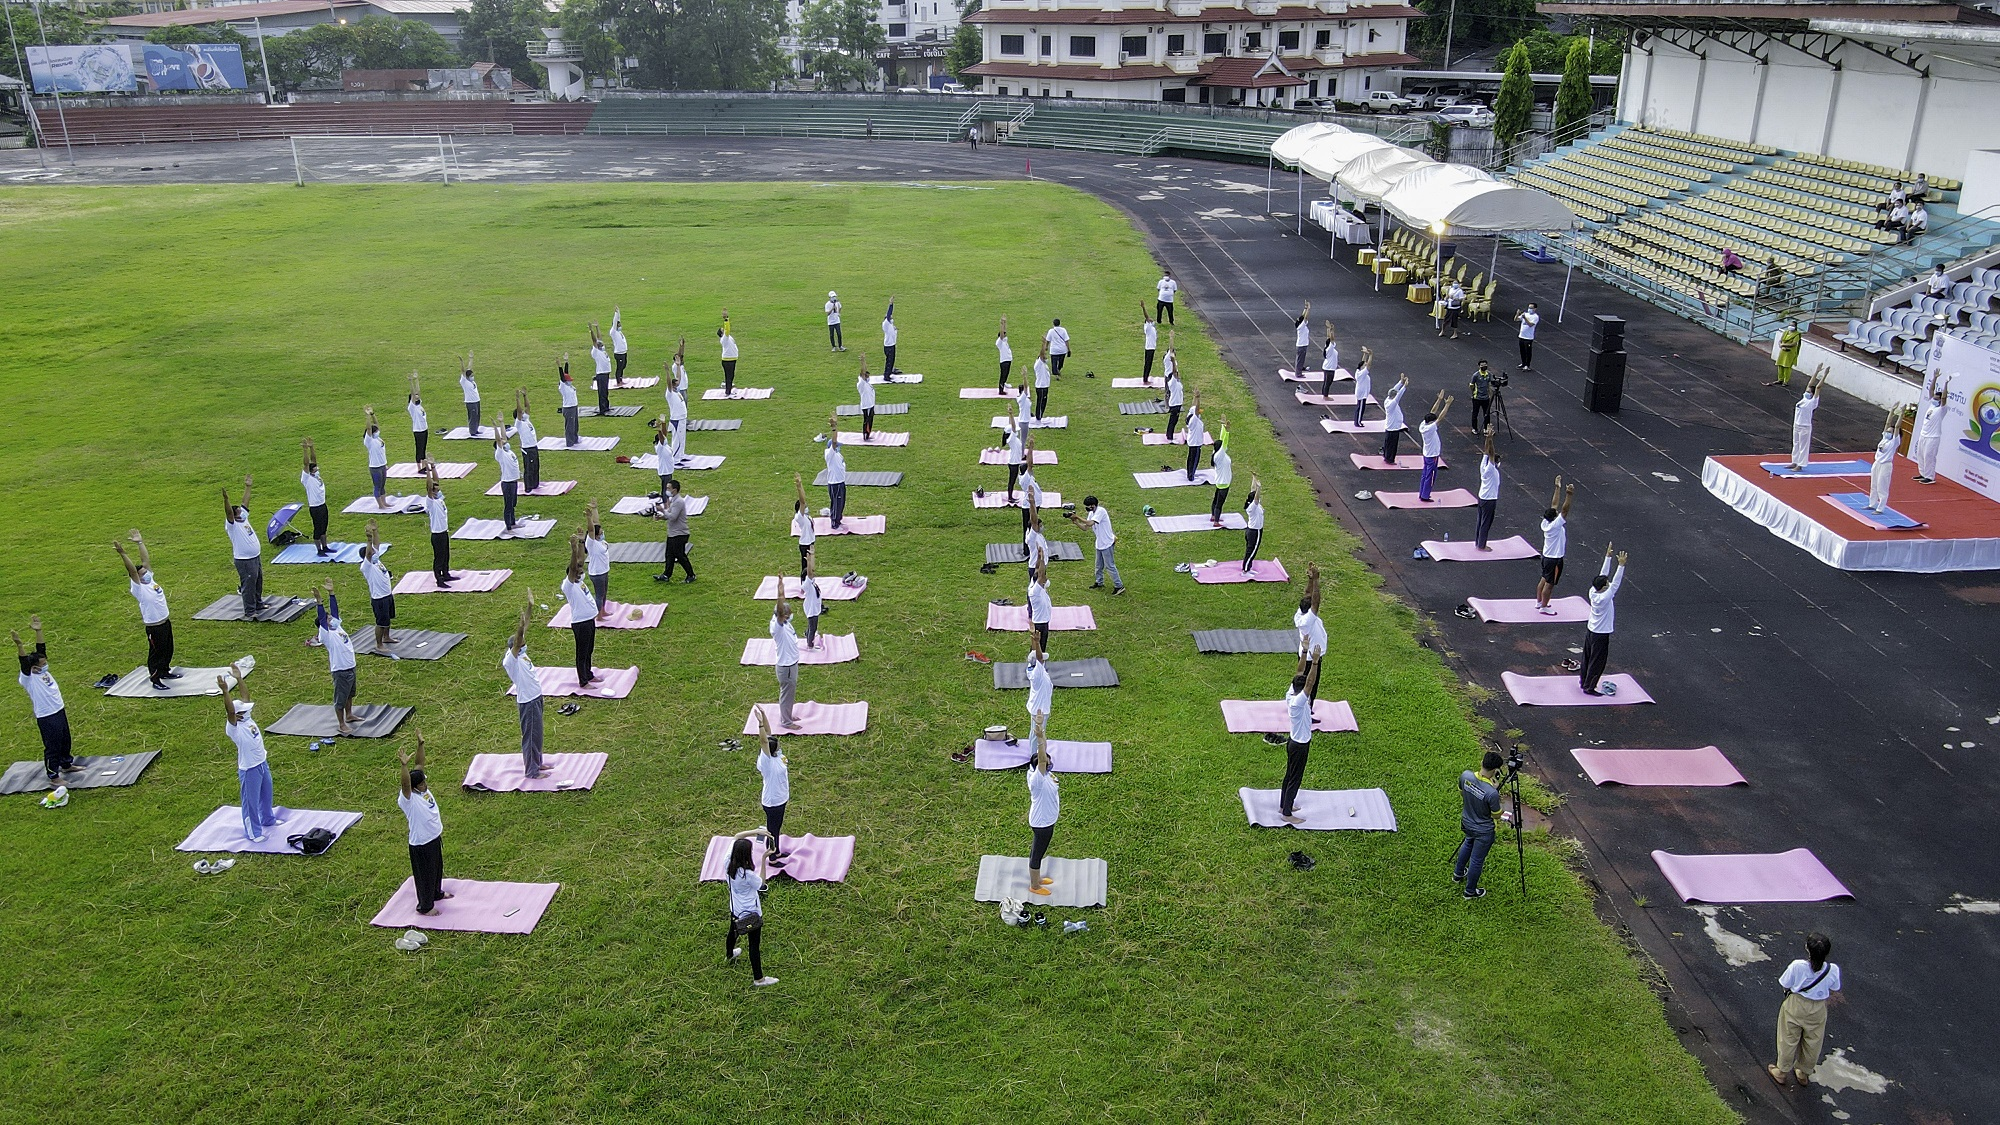 Celebration of 7th International Day of Yoga on 26 June 2021